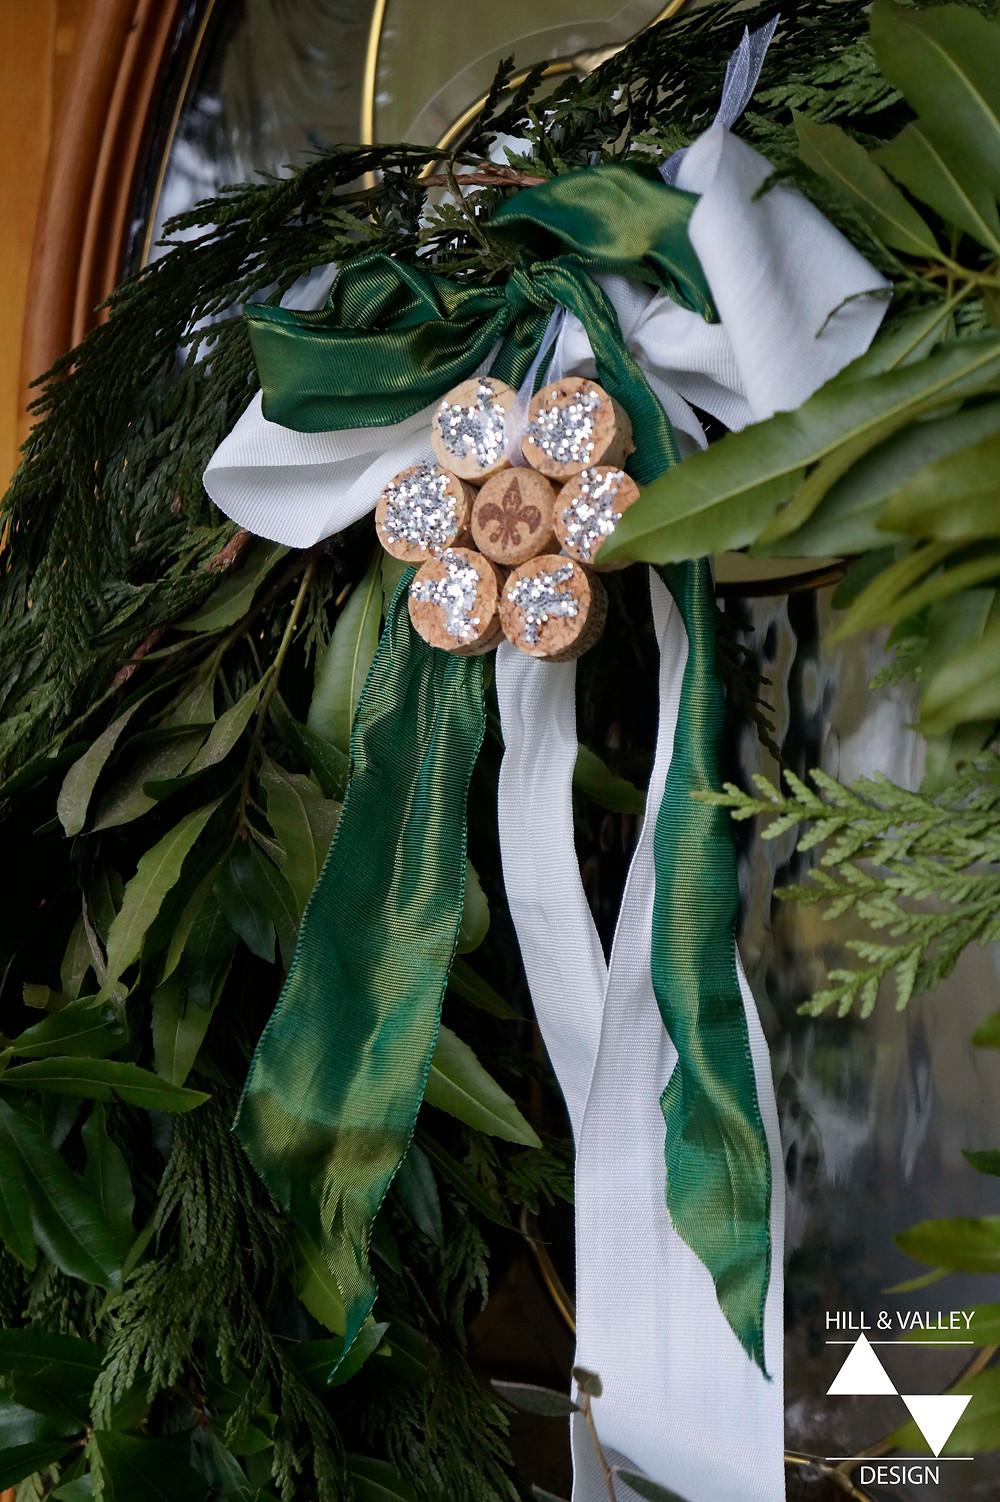 Wreath, cedar, ribbon, glitter, ornament, front door